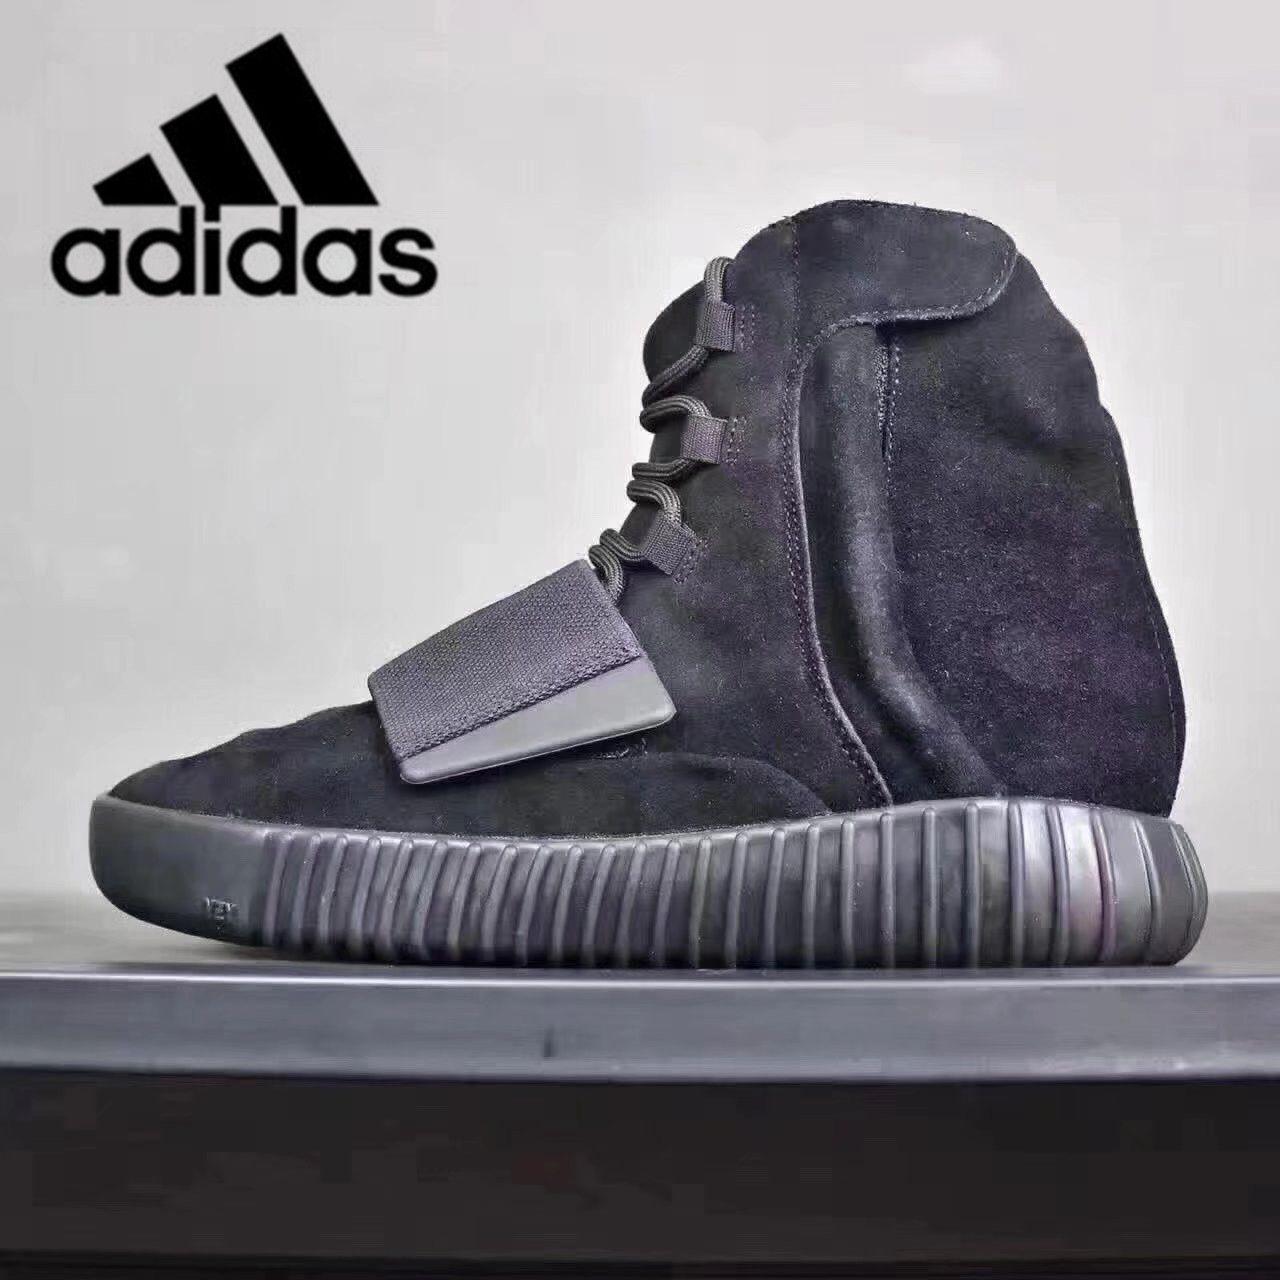 0abac87b3 2019 Original Air Yeezy 750 Kanye West Yeezys Yezzy 750s Runner Running  Shoes Yezzys Men Women Grey Gum Black Blackout Chocolate Brown Shiny OG  Light Brown ...